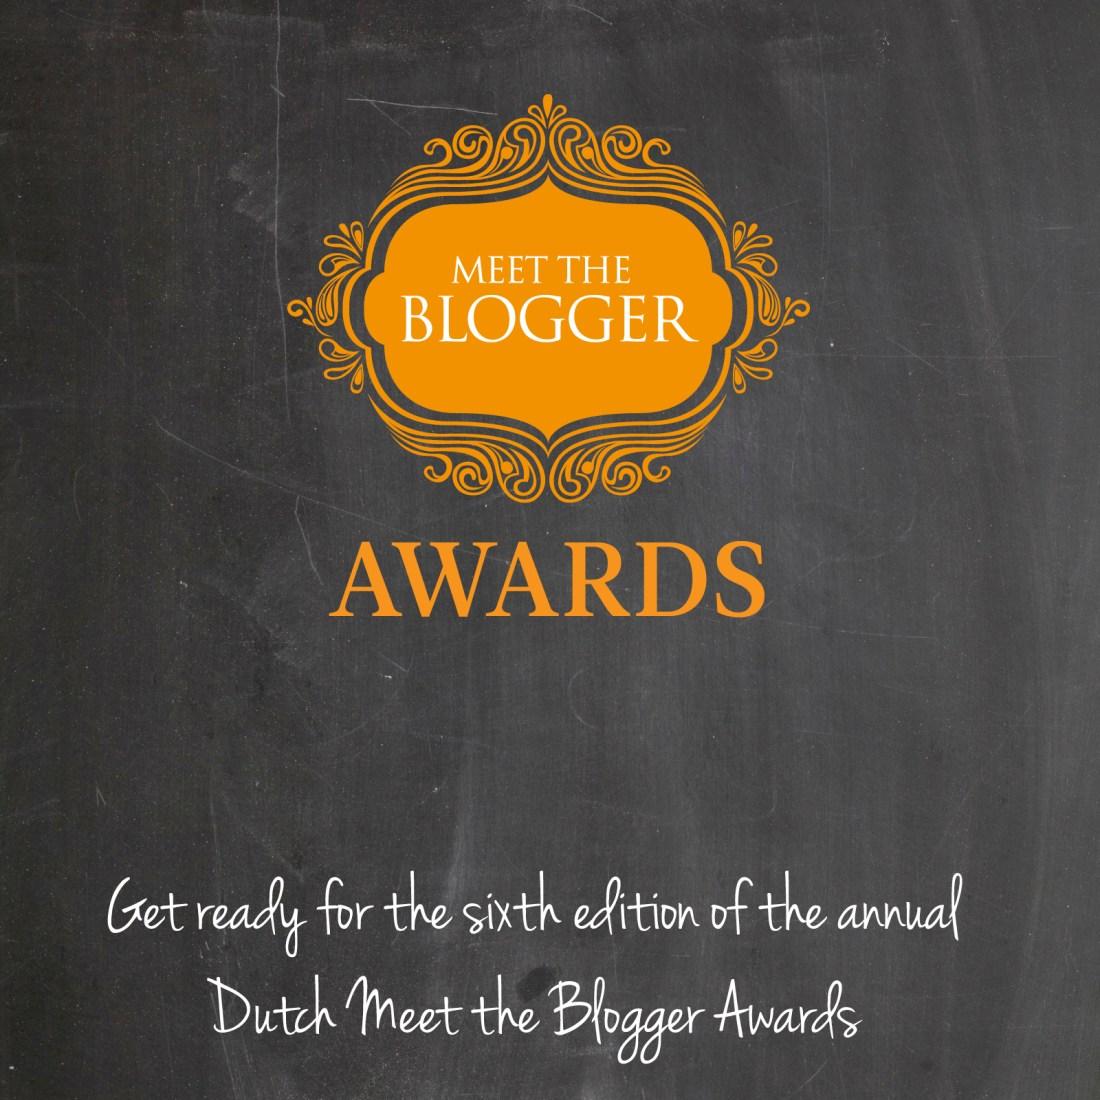 meet the blogger awards 2017